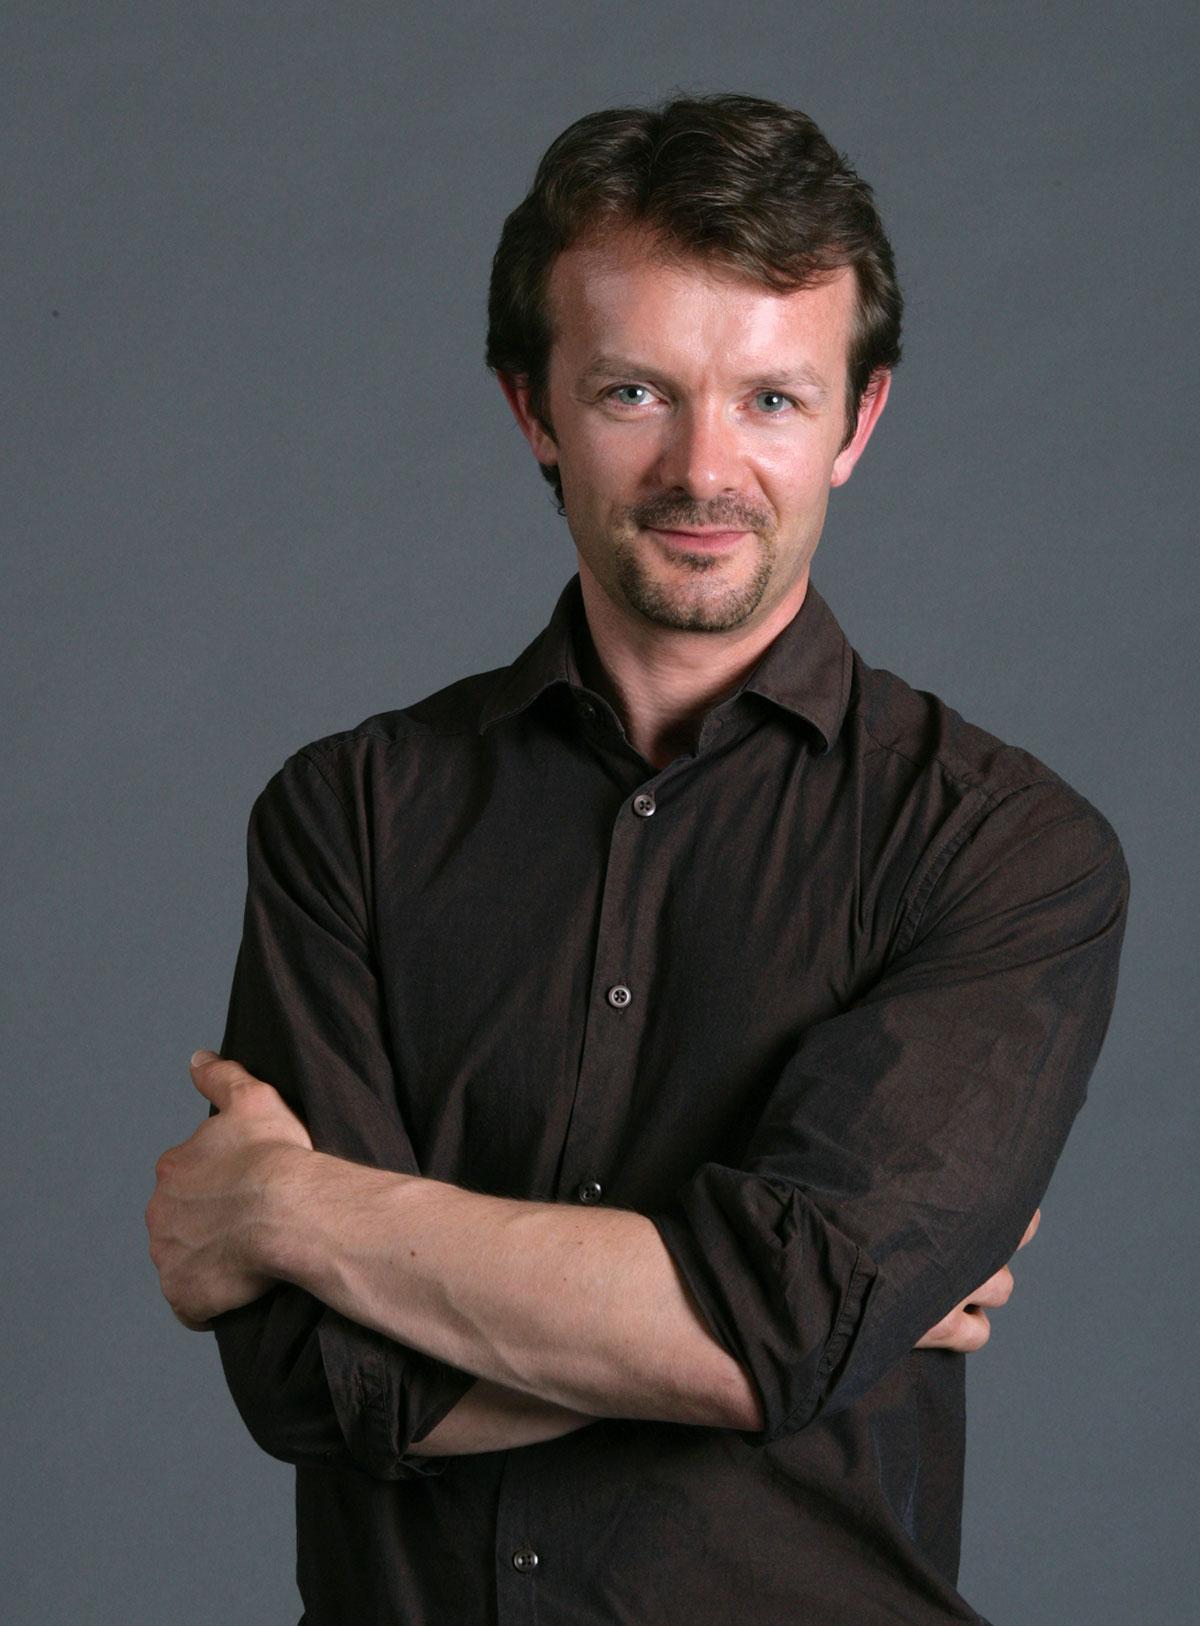 Stéphane Dalle